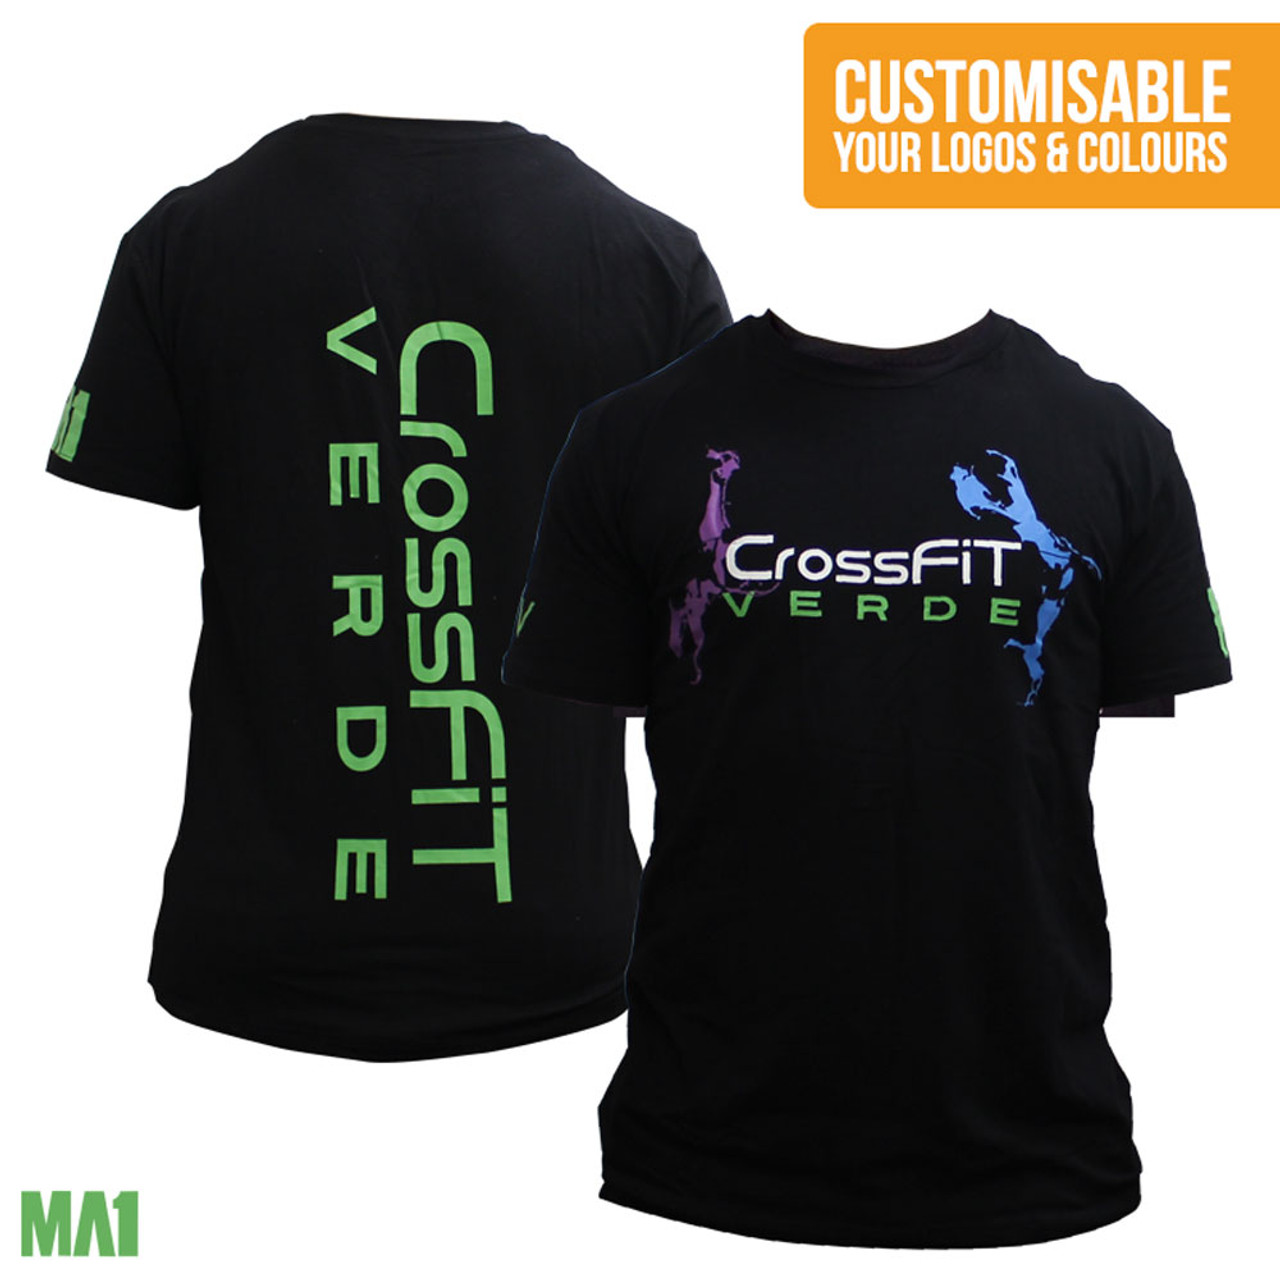 Premium Ma1 Cotton Kids Club T Shirt Custom Made Ideal For Club